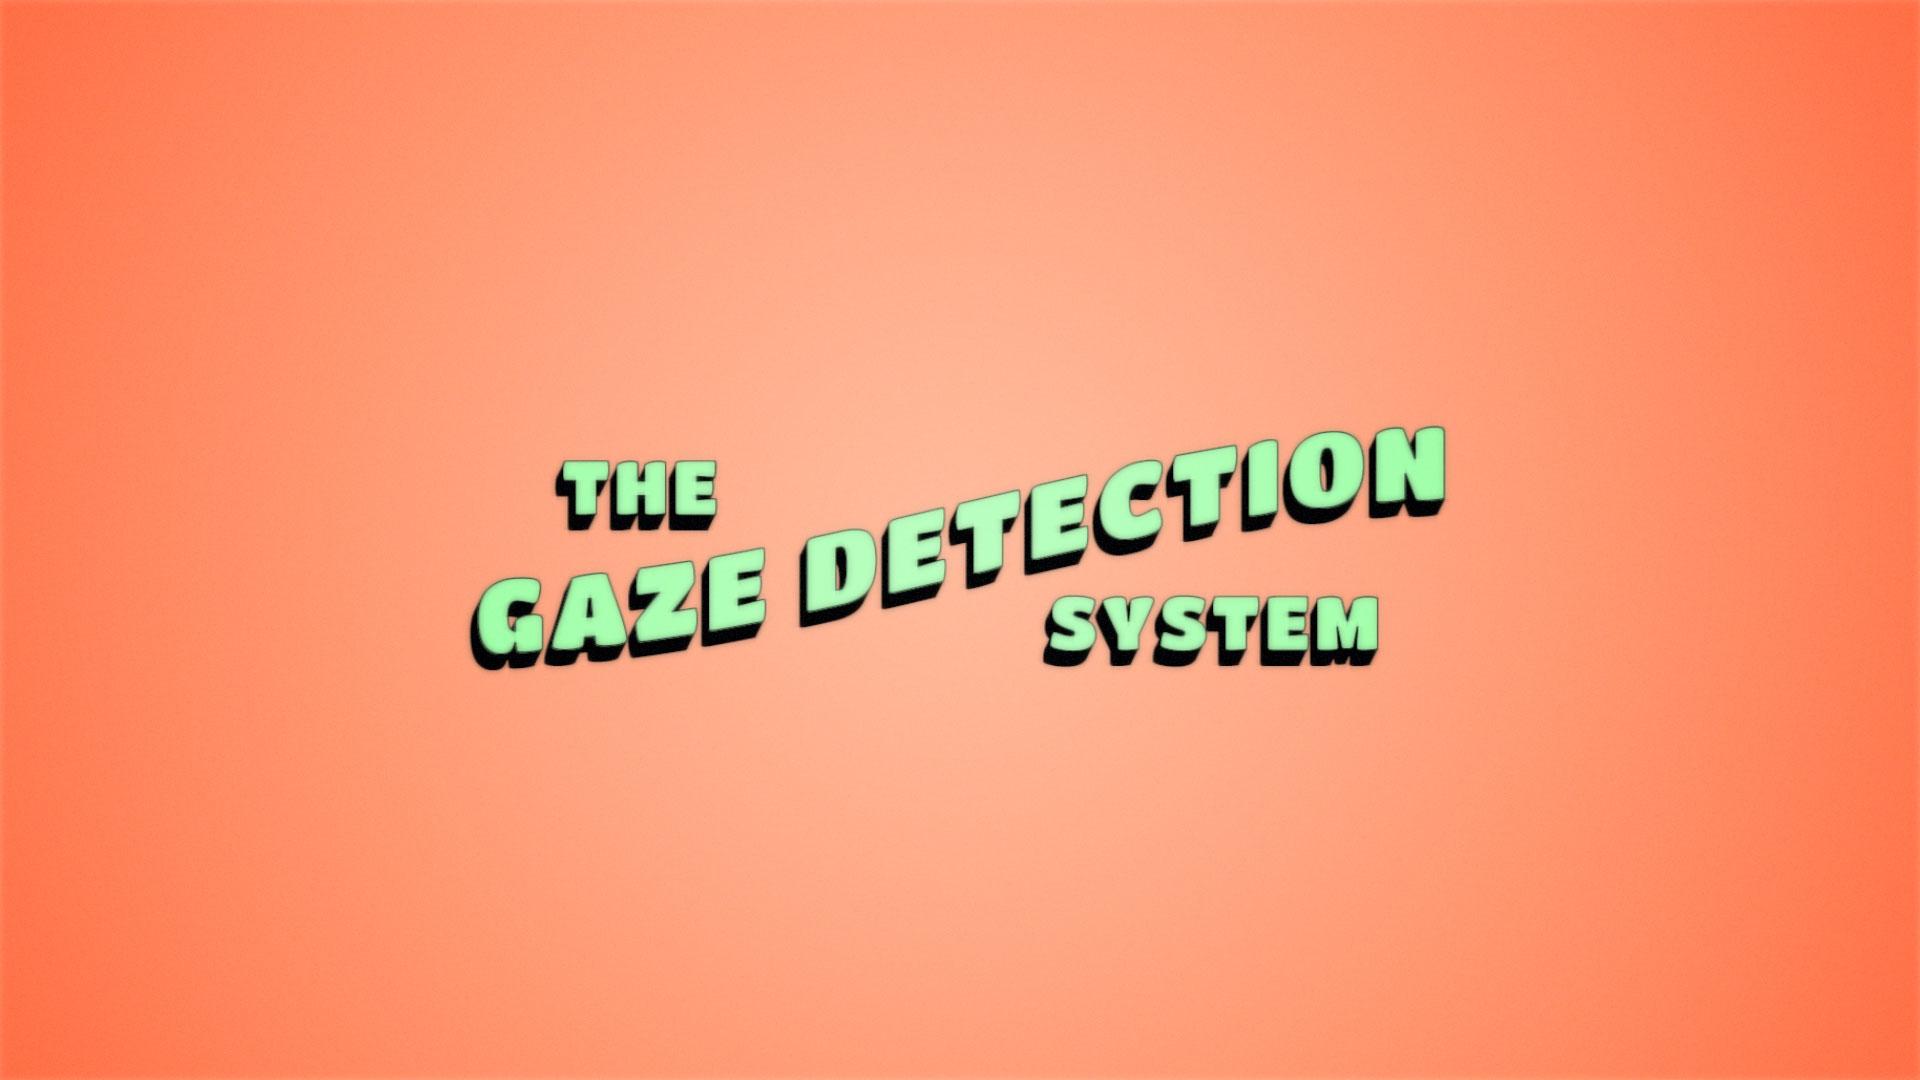 5 The Gaze Detection System.jpg